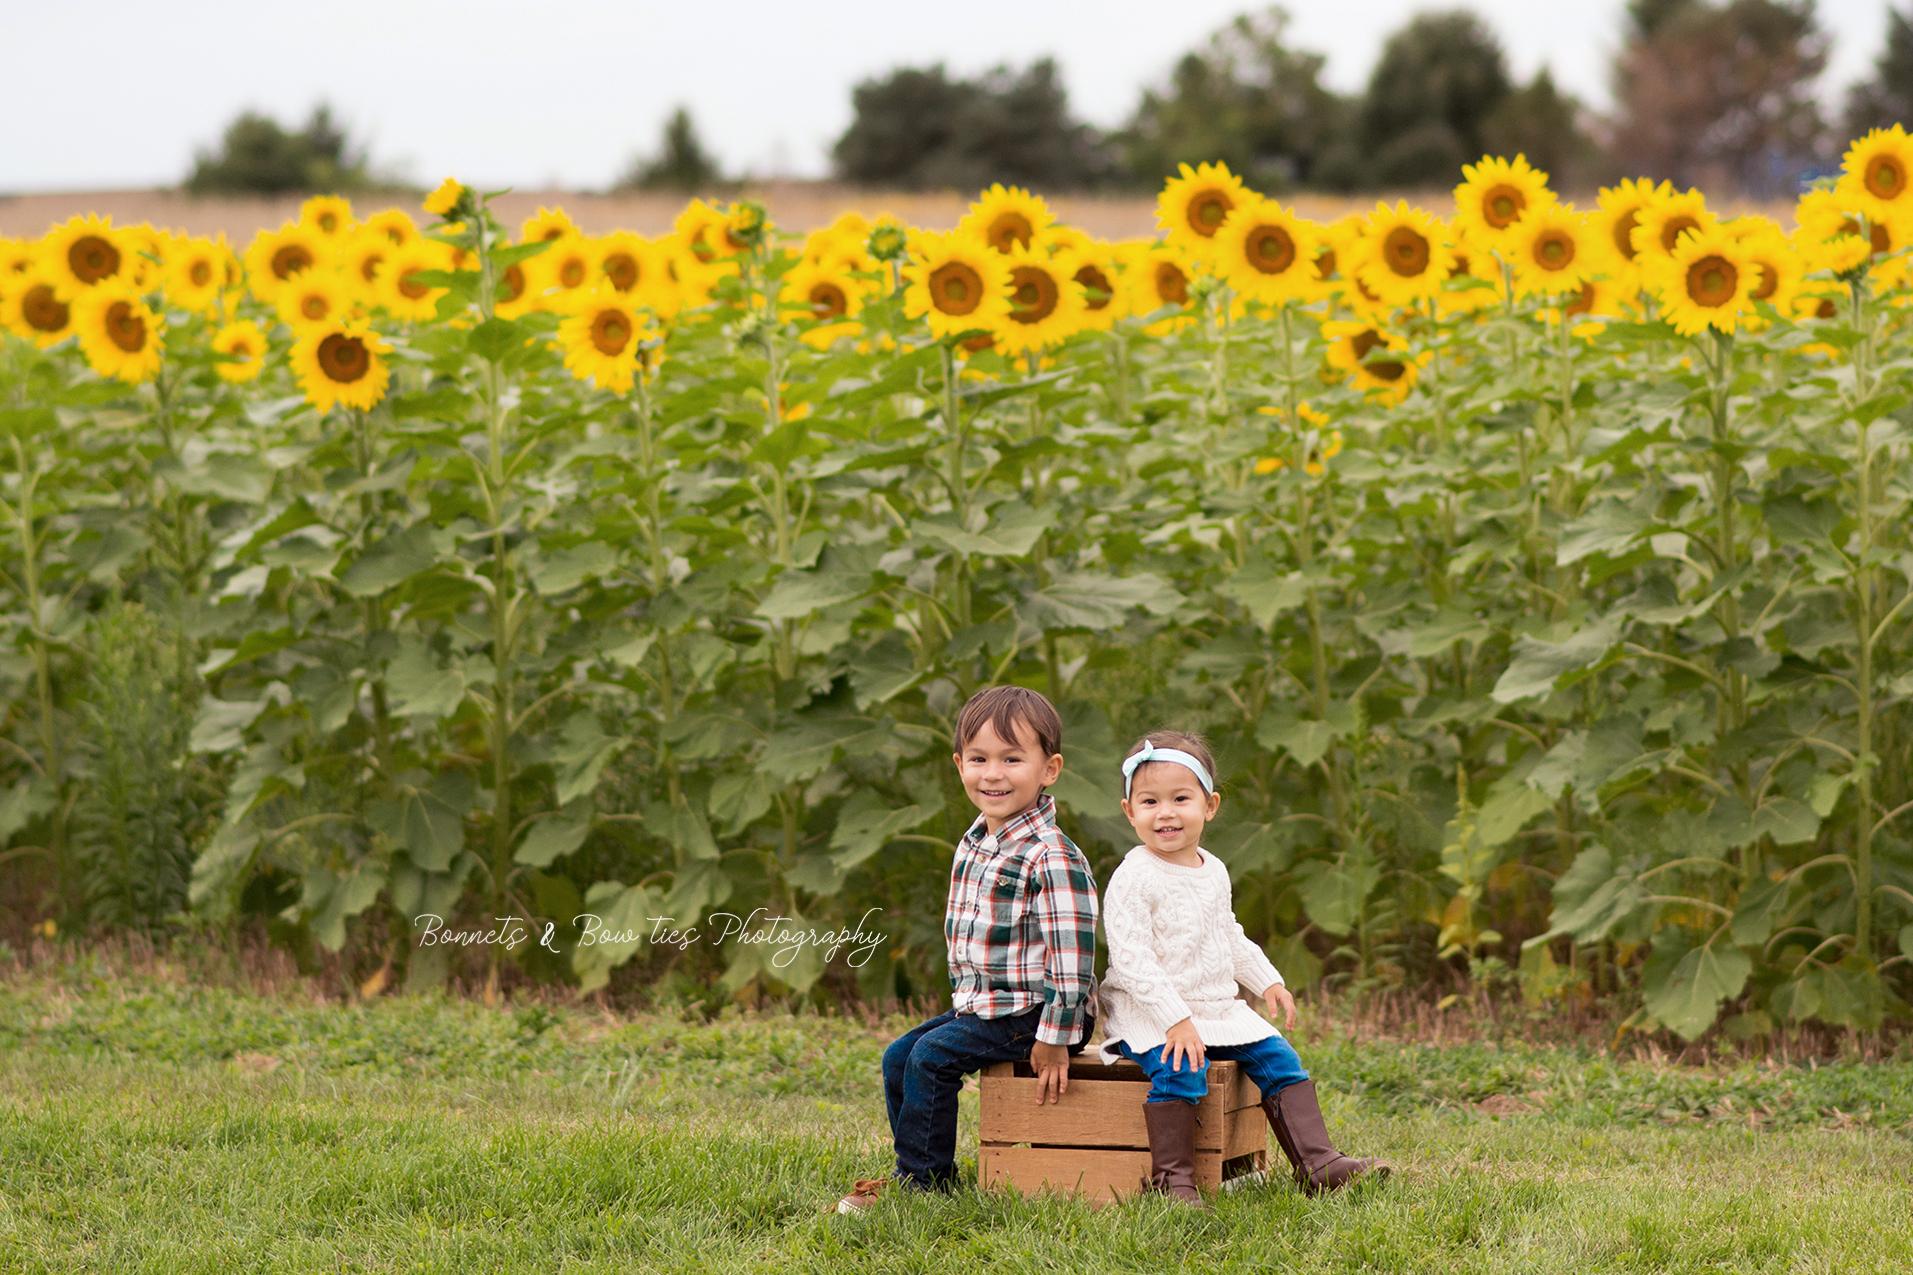 boy and girl in a sunflower field.jpg